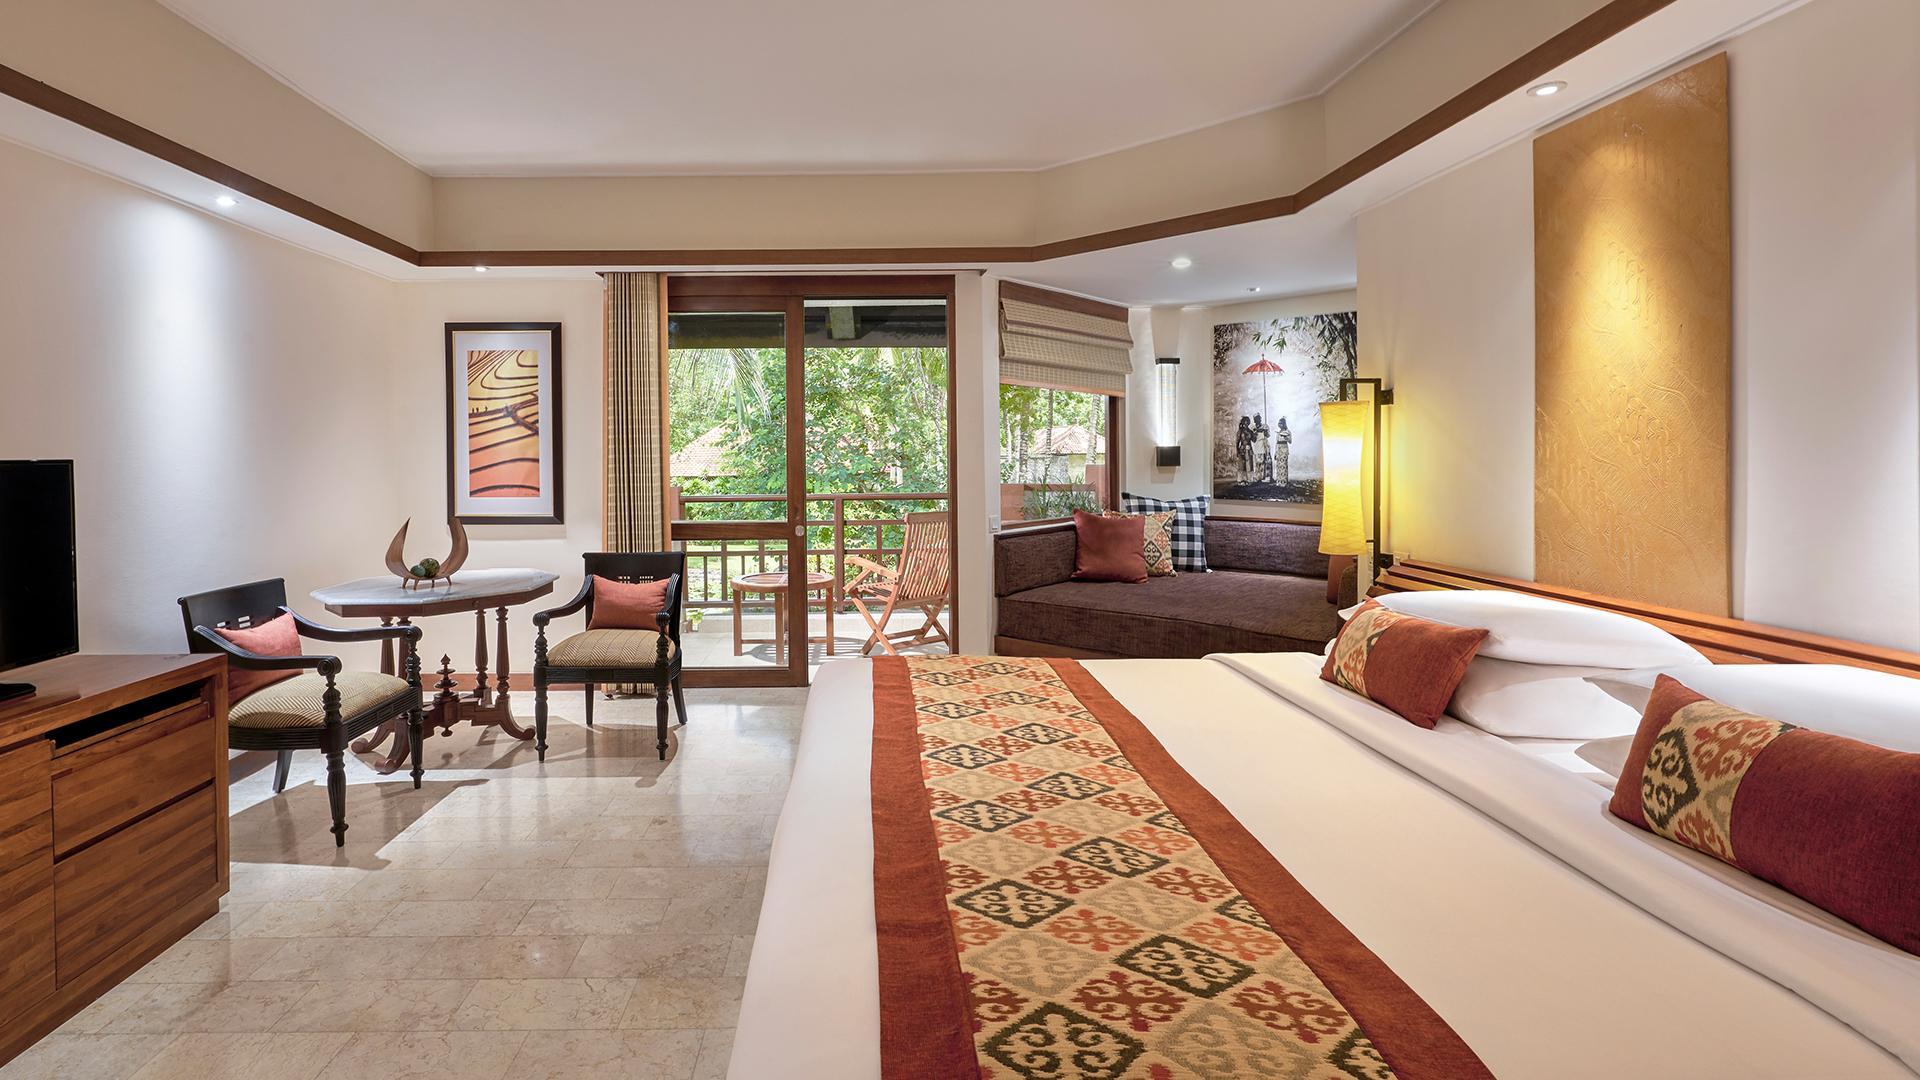 Standard Grand Room image 1 at Grand Hyatt Bali by Kabupaten Badung, Bali, Indonesia